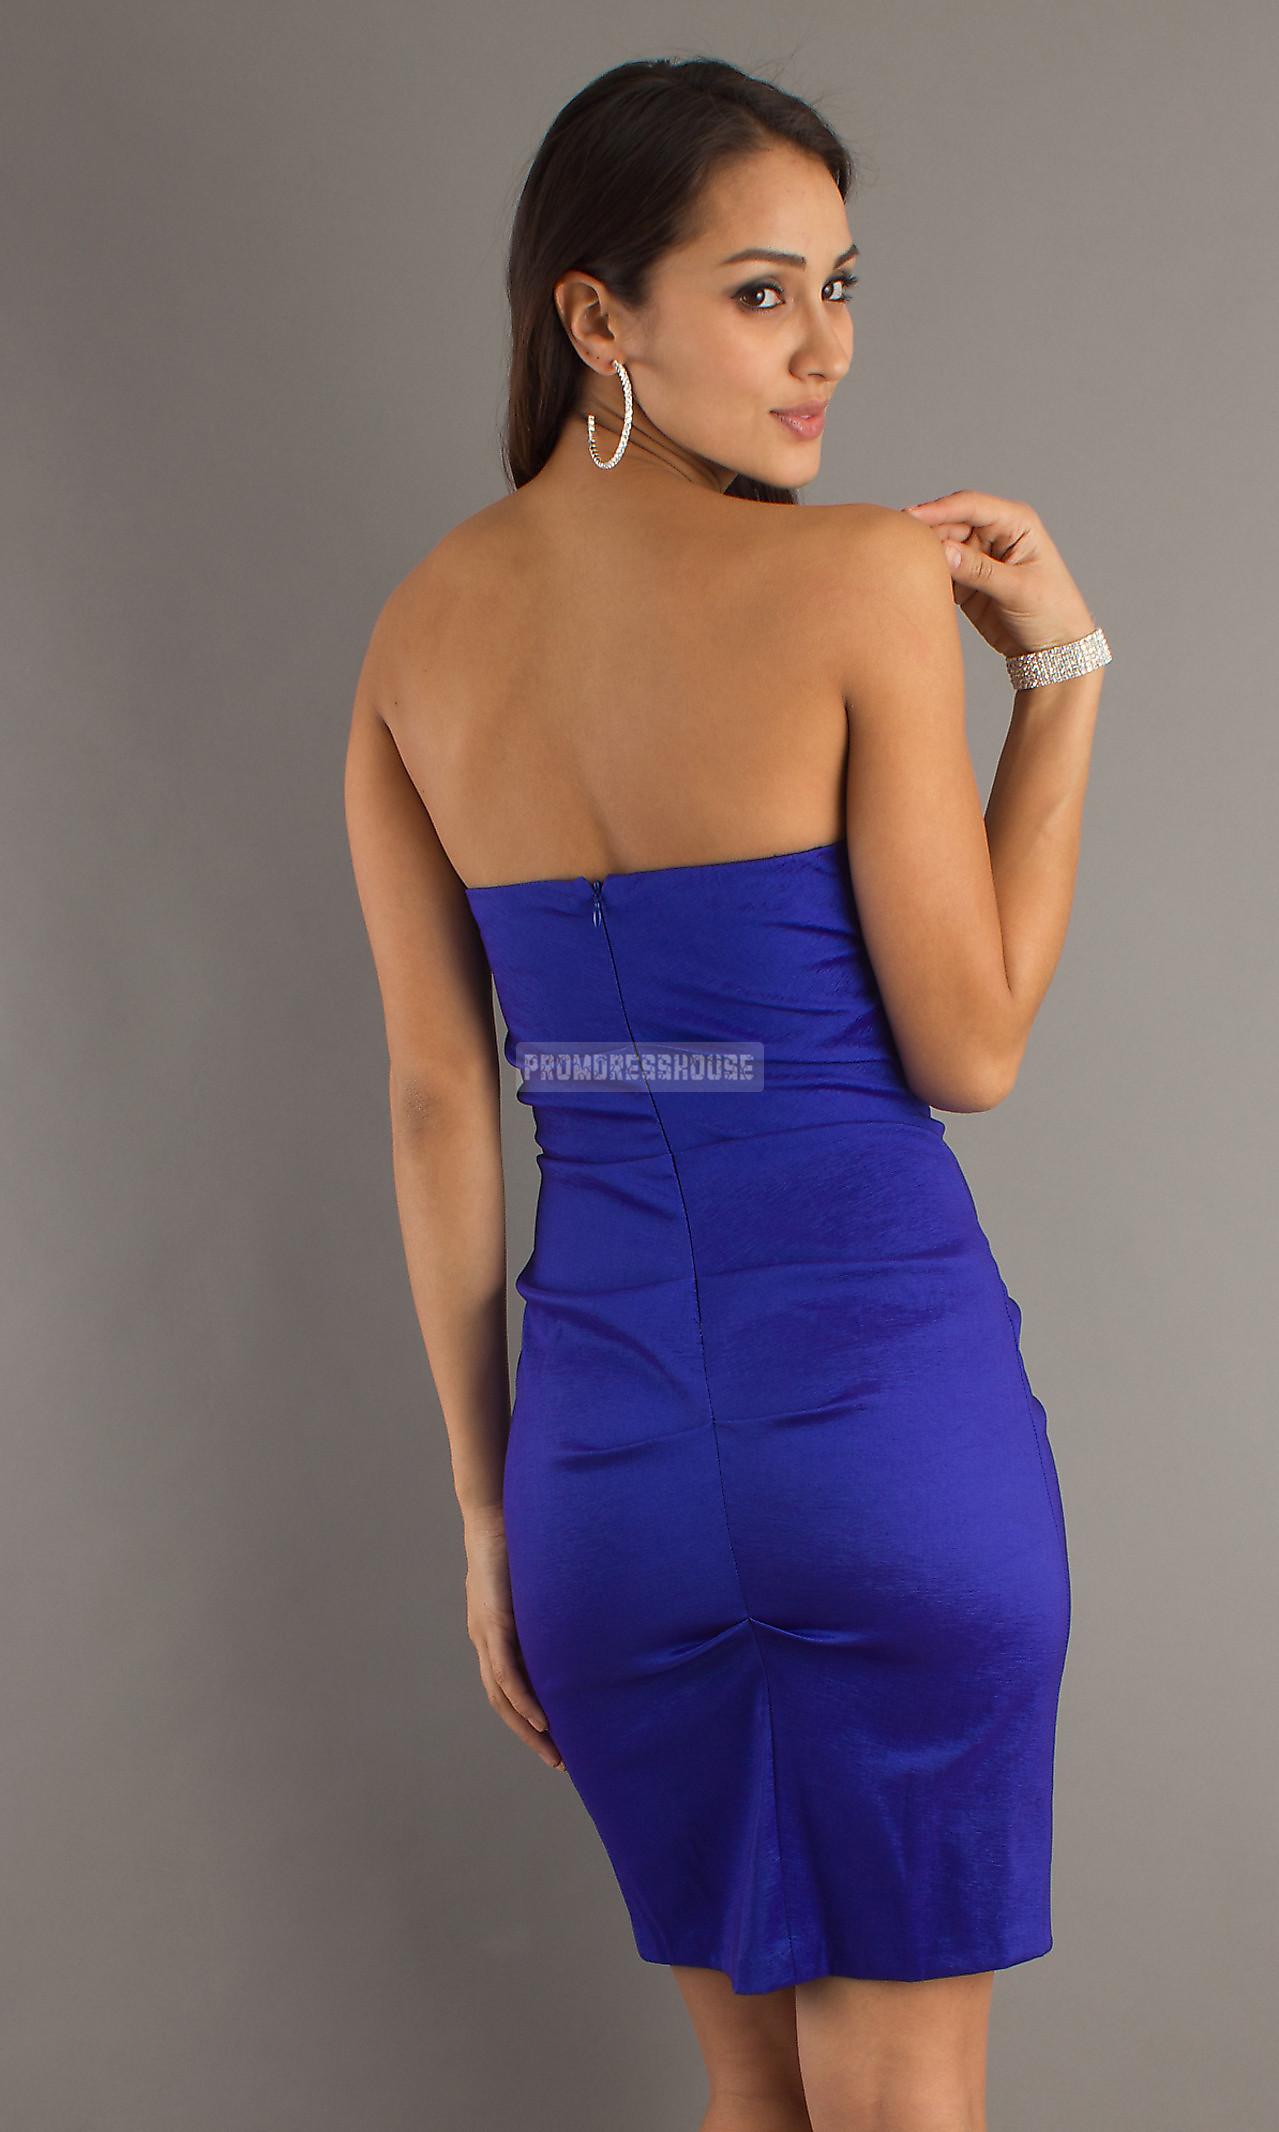 Short Length Royal Blue Ruched Satin Sheath Beading Cocktail Dress - Promdresshouse.com